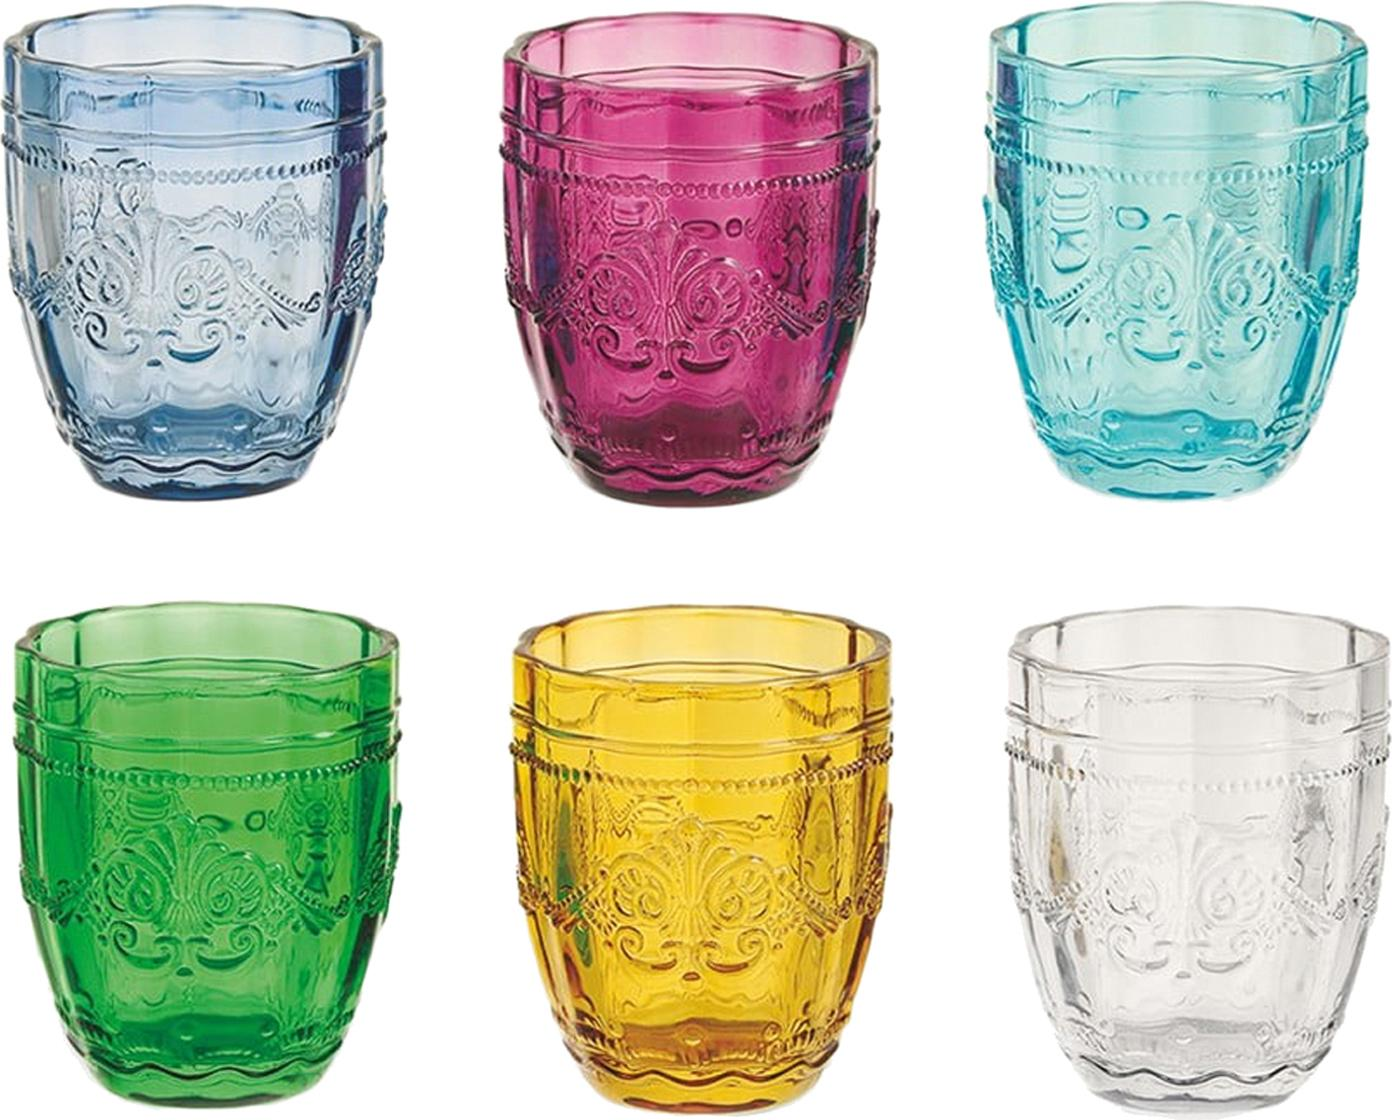 Waterglazen-set Syrah met structuurpatroon, 6-delig, Glas, Multicolour, Ø 8 x H 10 cm